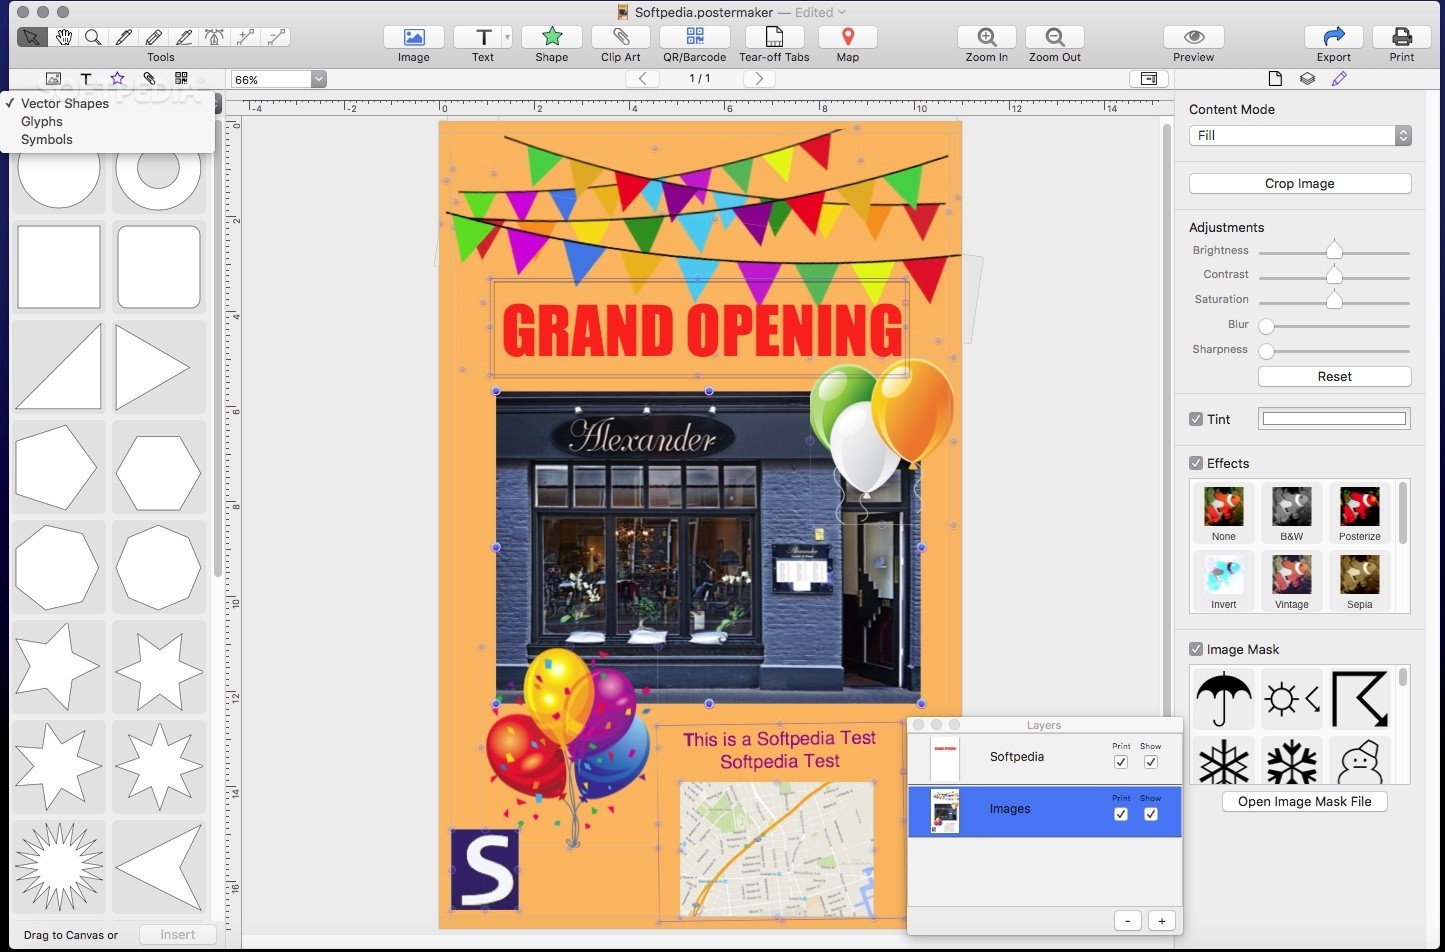 poster maker mac 1 1 0 build 2 download